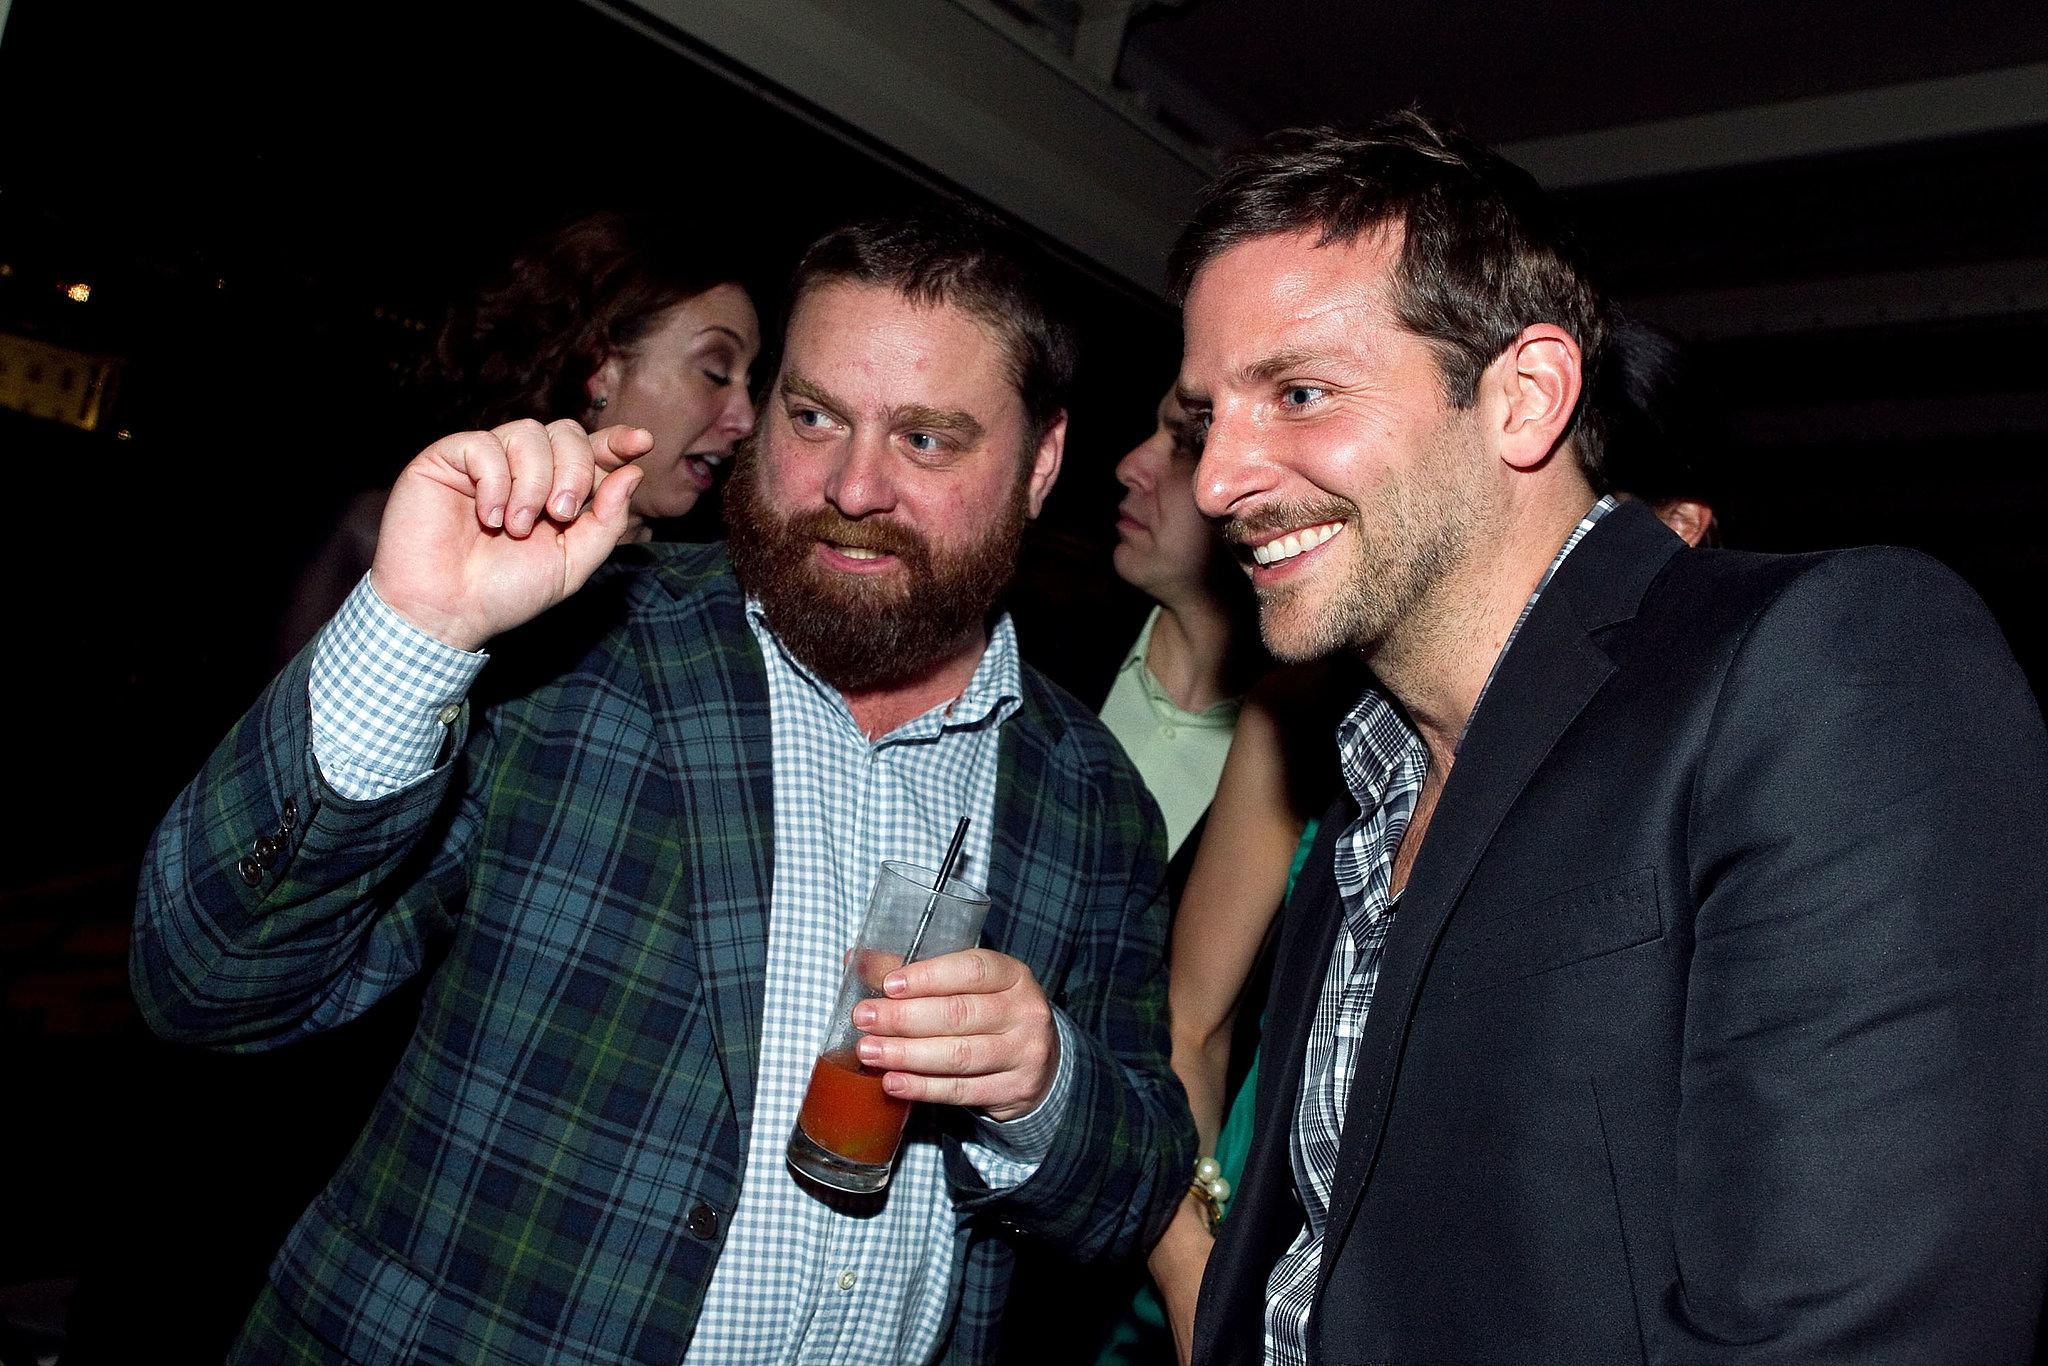 Zach Galifianakis and Bradley Cooper